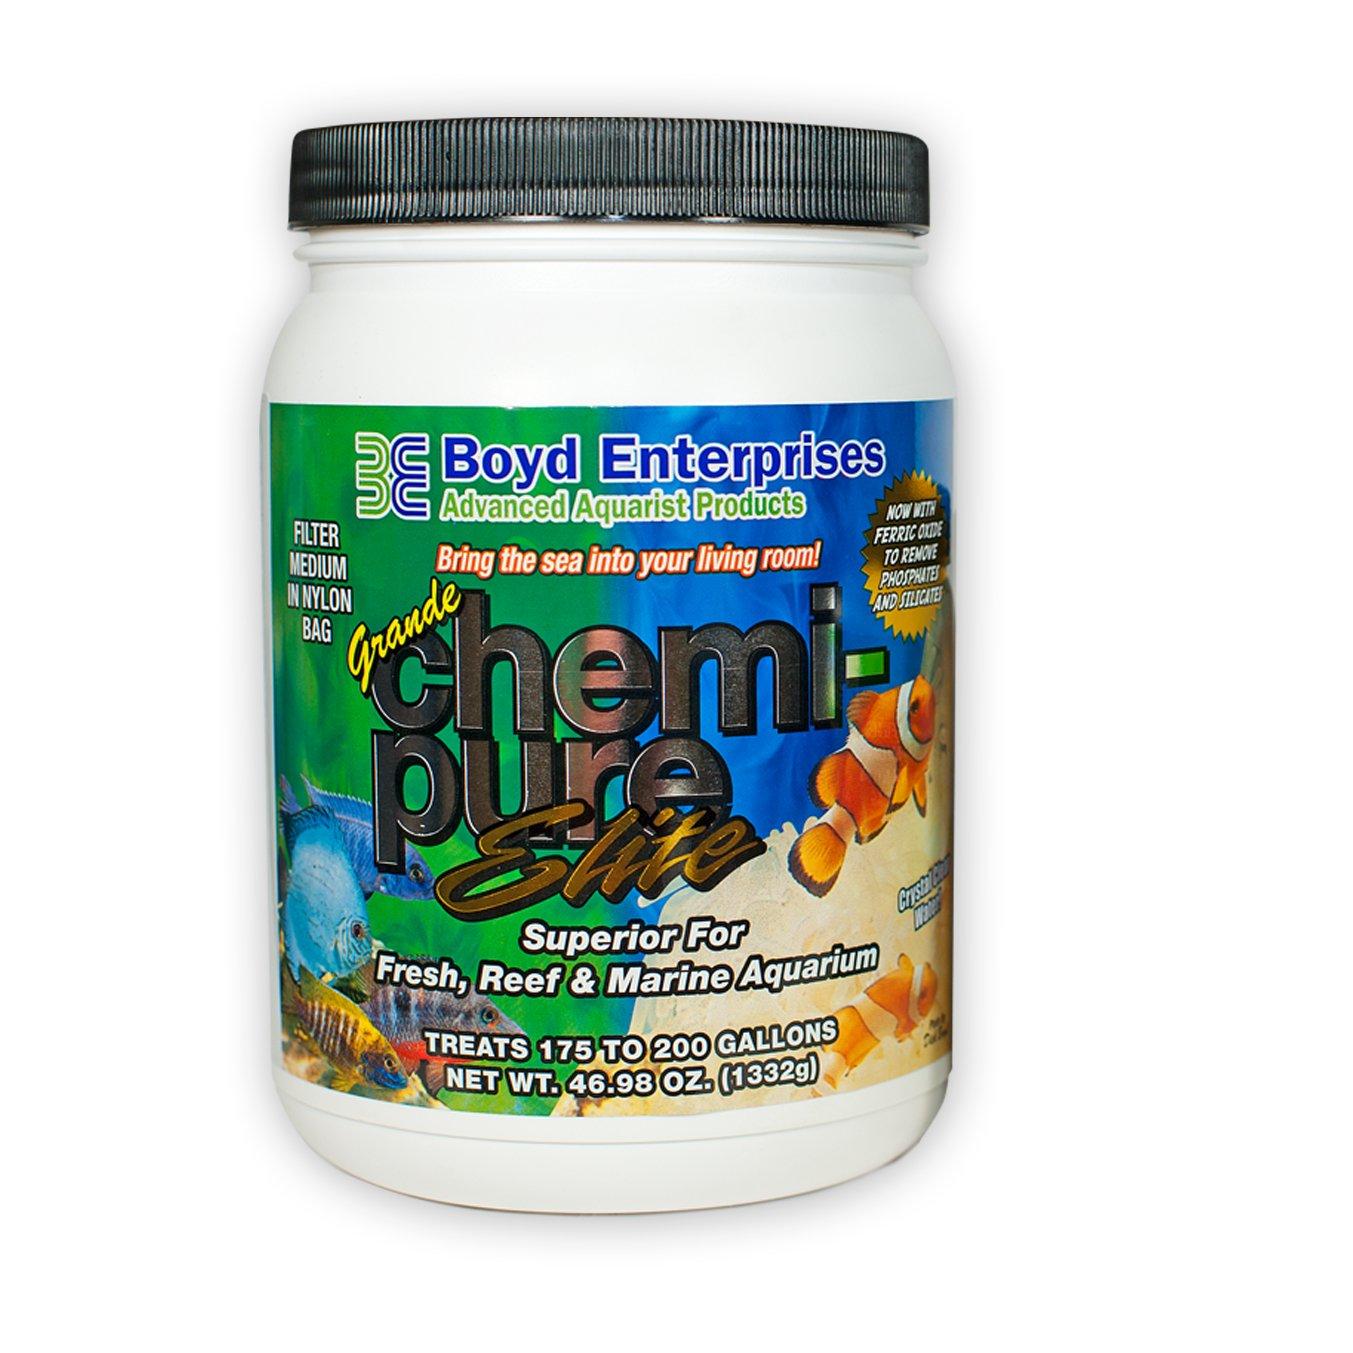 Boyd Enterprises ABE16745 Chemipure Elite Grande for Aquarium, 46 Oz. (1332g) by Boyd Enterprises B00798ZDV2